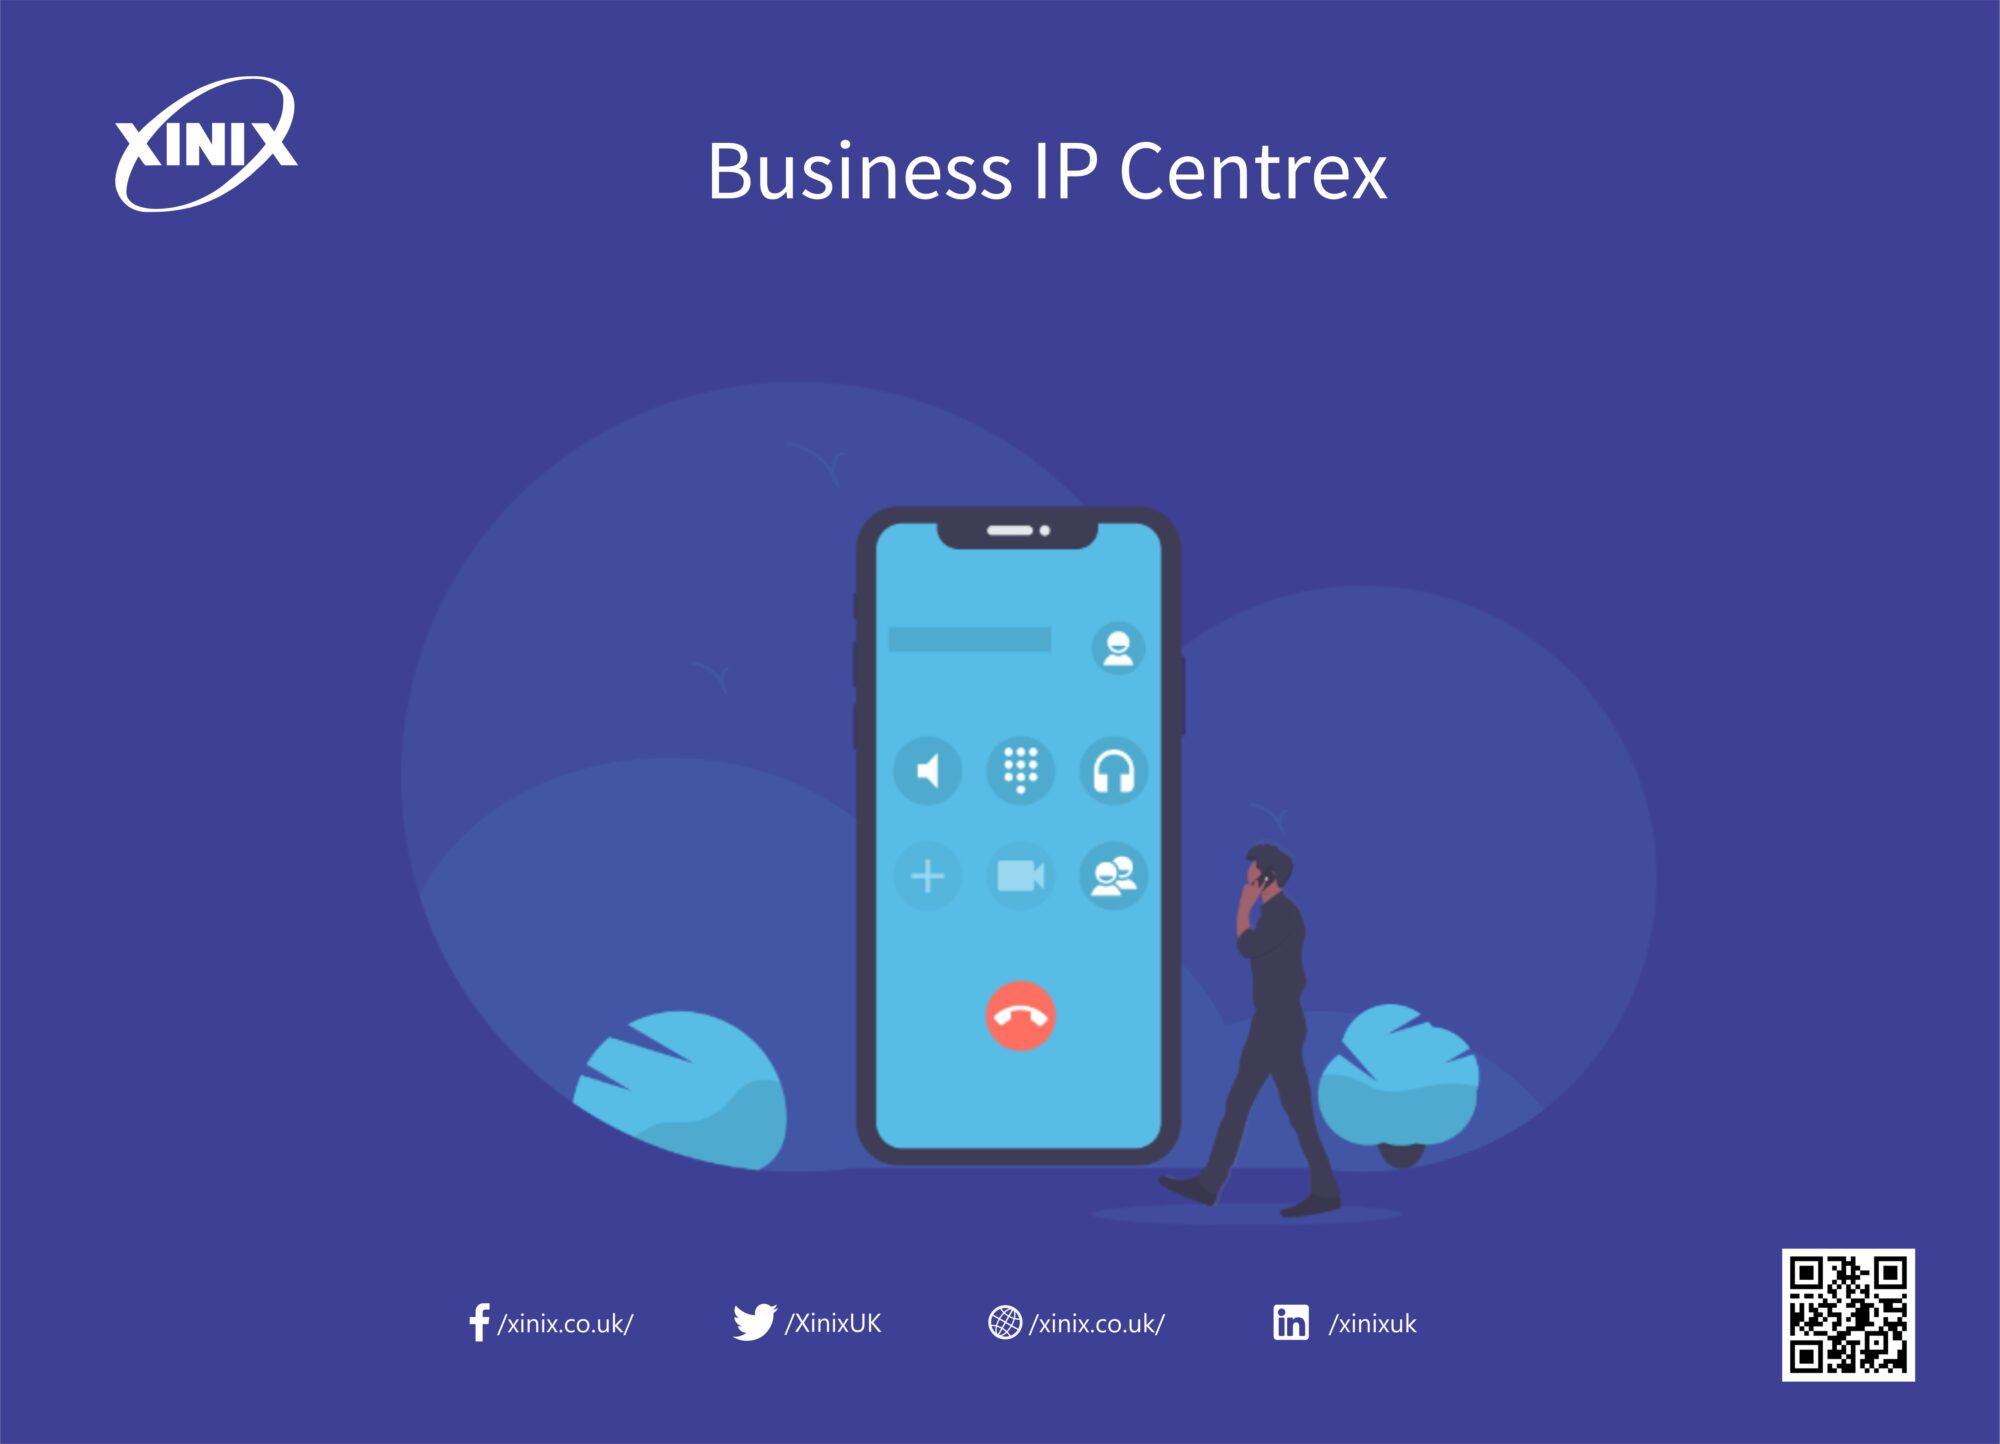 Business IP Centrex